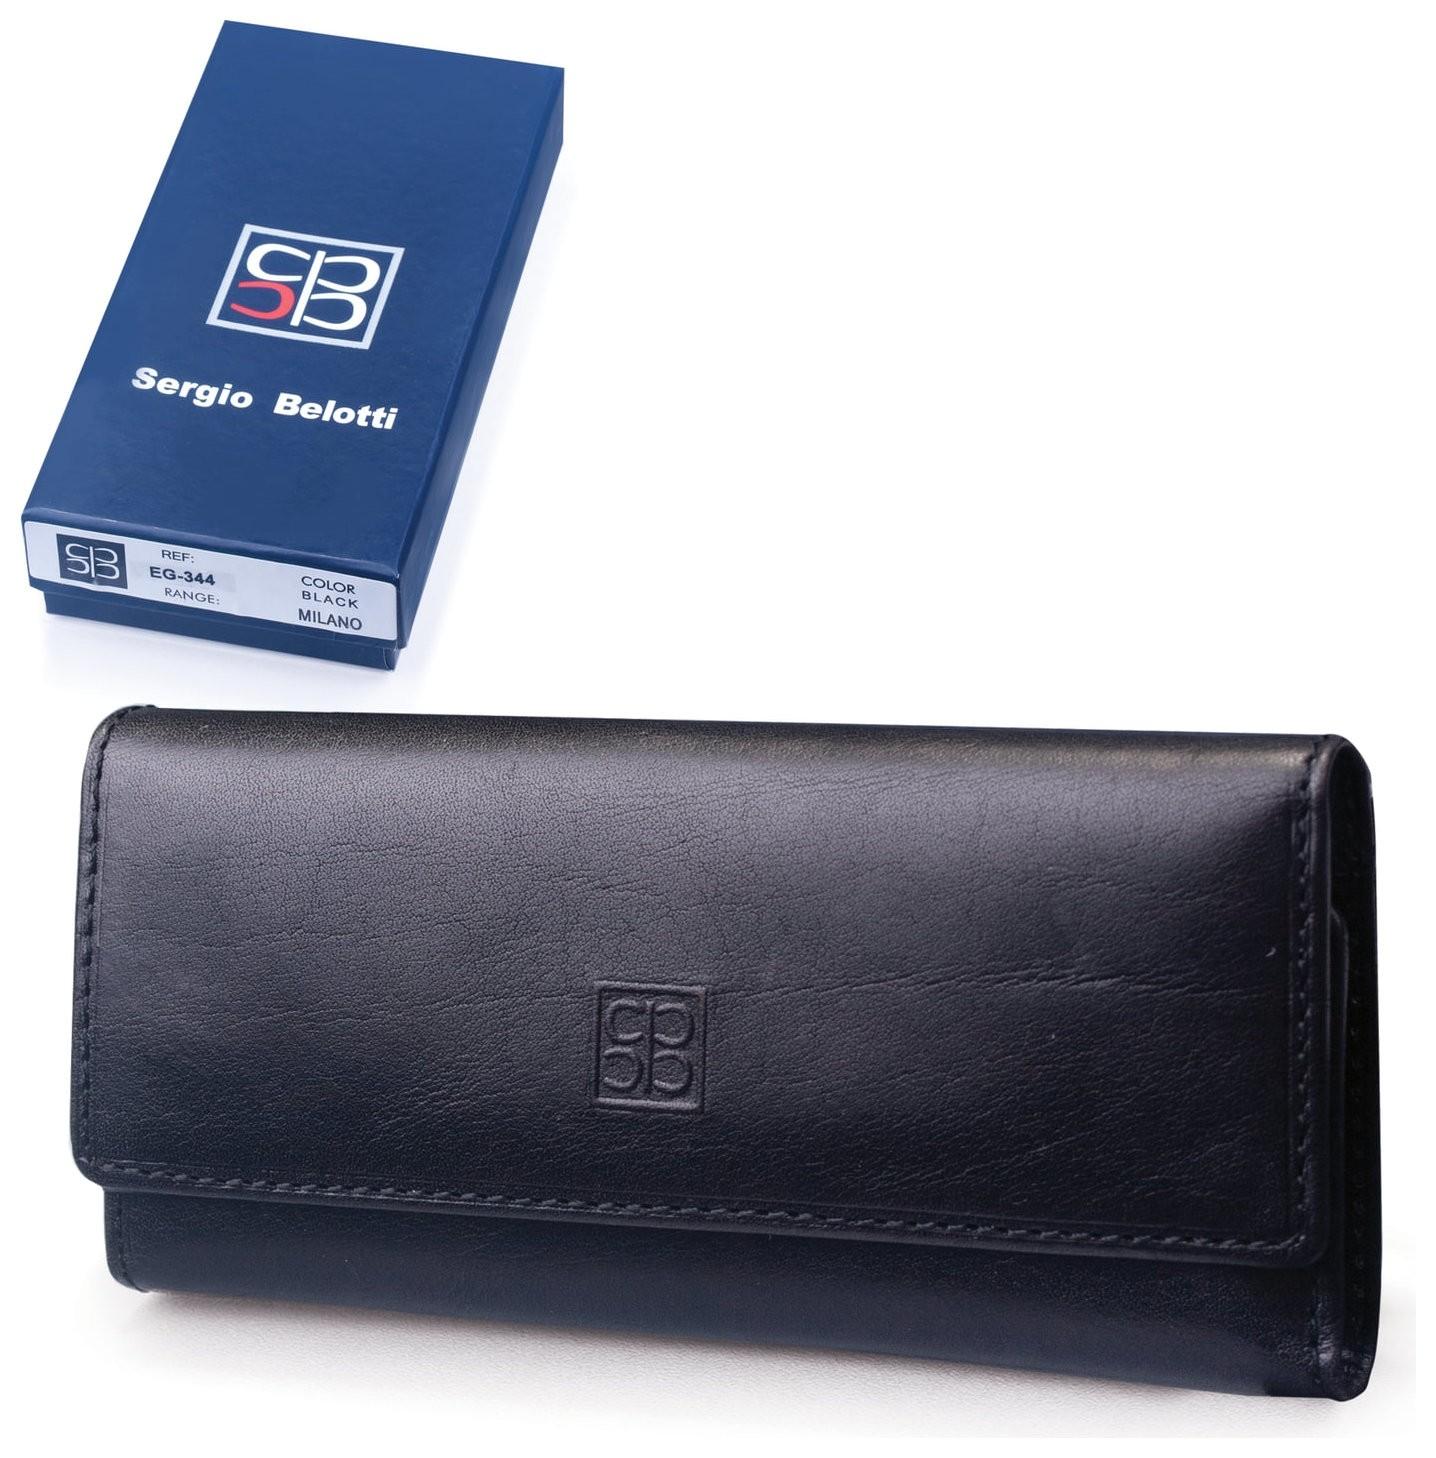 Футляр для ключей Sergio Belotti, натуральная кожа, застежка - 2 магнитные кнопки, 57х130х20 мм, черный, 344 Sergio Belotti